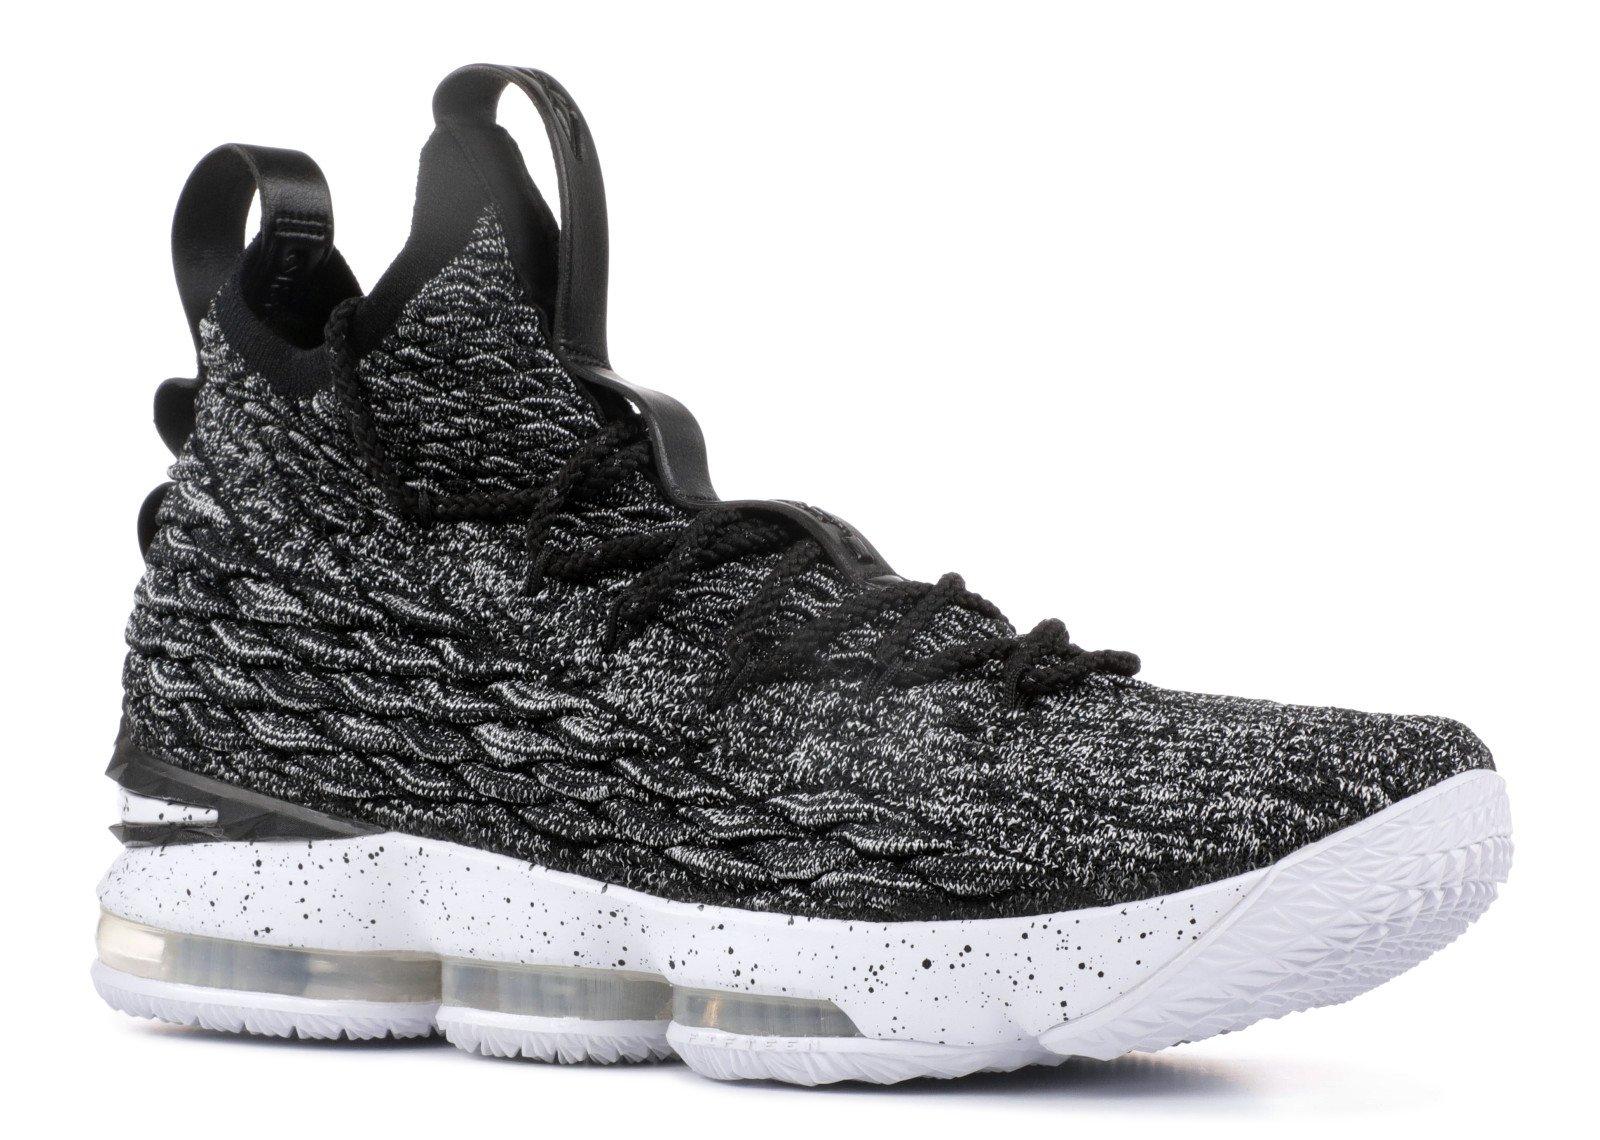 435e38dcf7d5 Nike - LEBRON 15  ASHES  - 897648-002 - Walmart.com